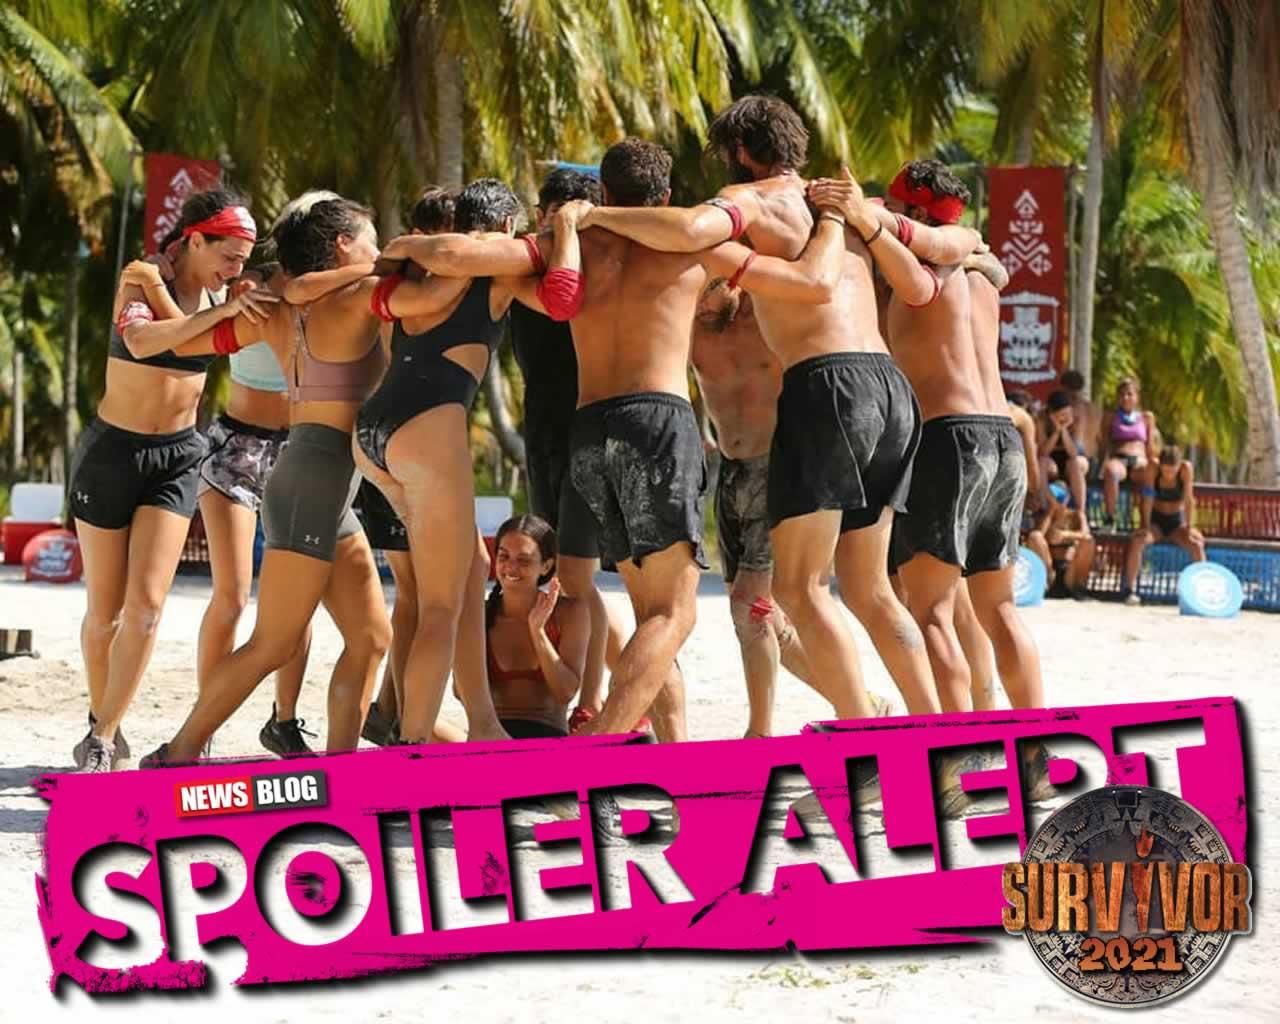 Survivor spoiler: Αποχωρεί οικειοθελώς η Σοφία Μαργαρίτη;